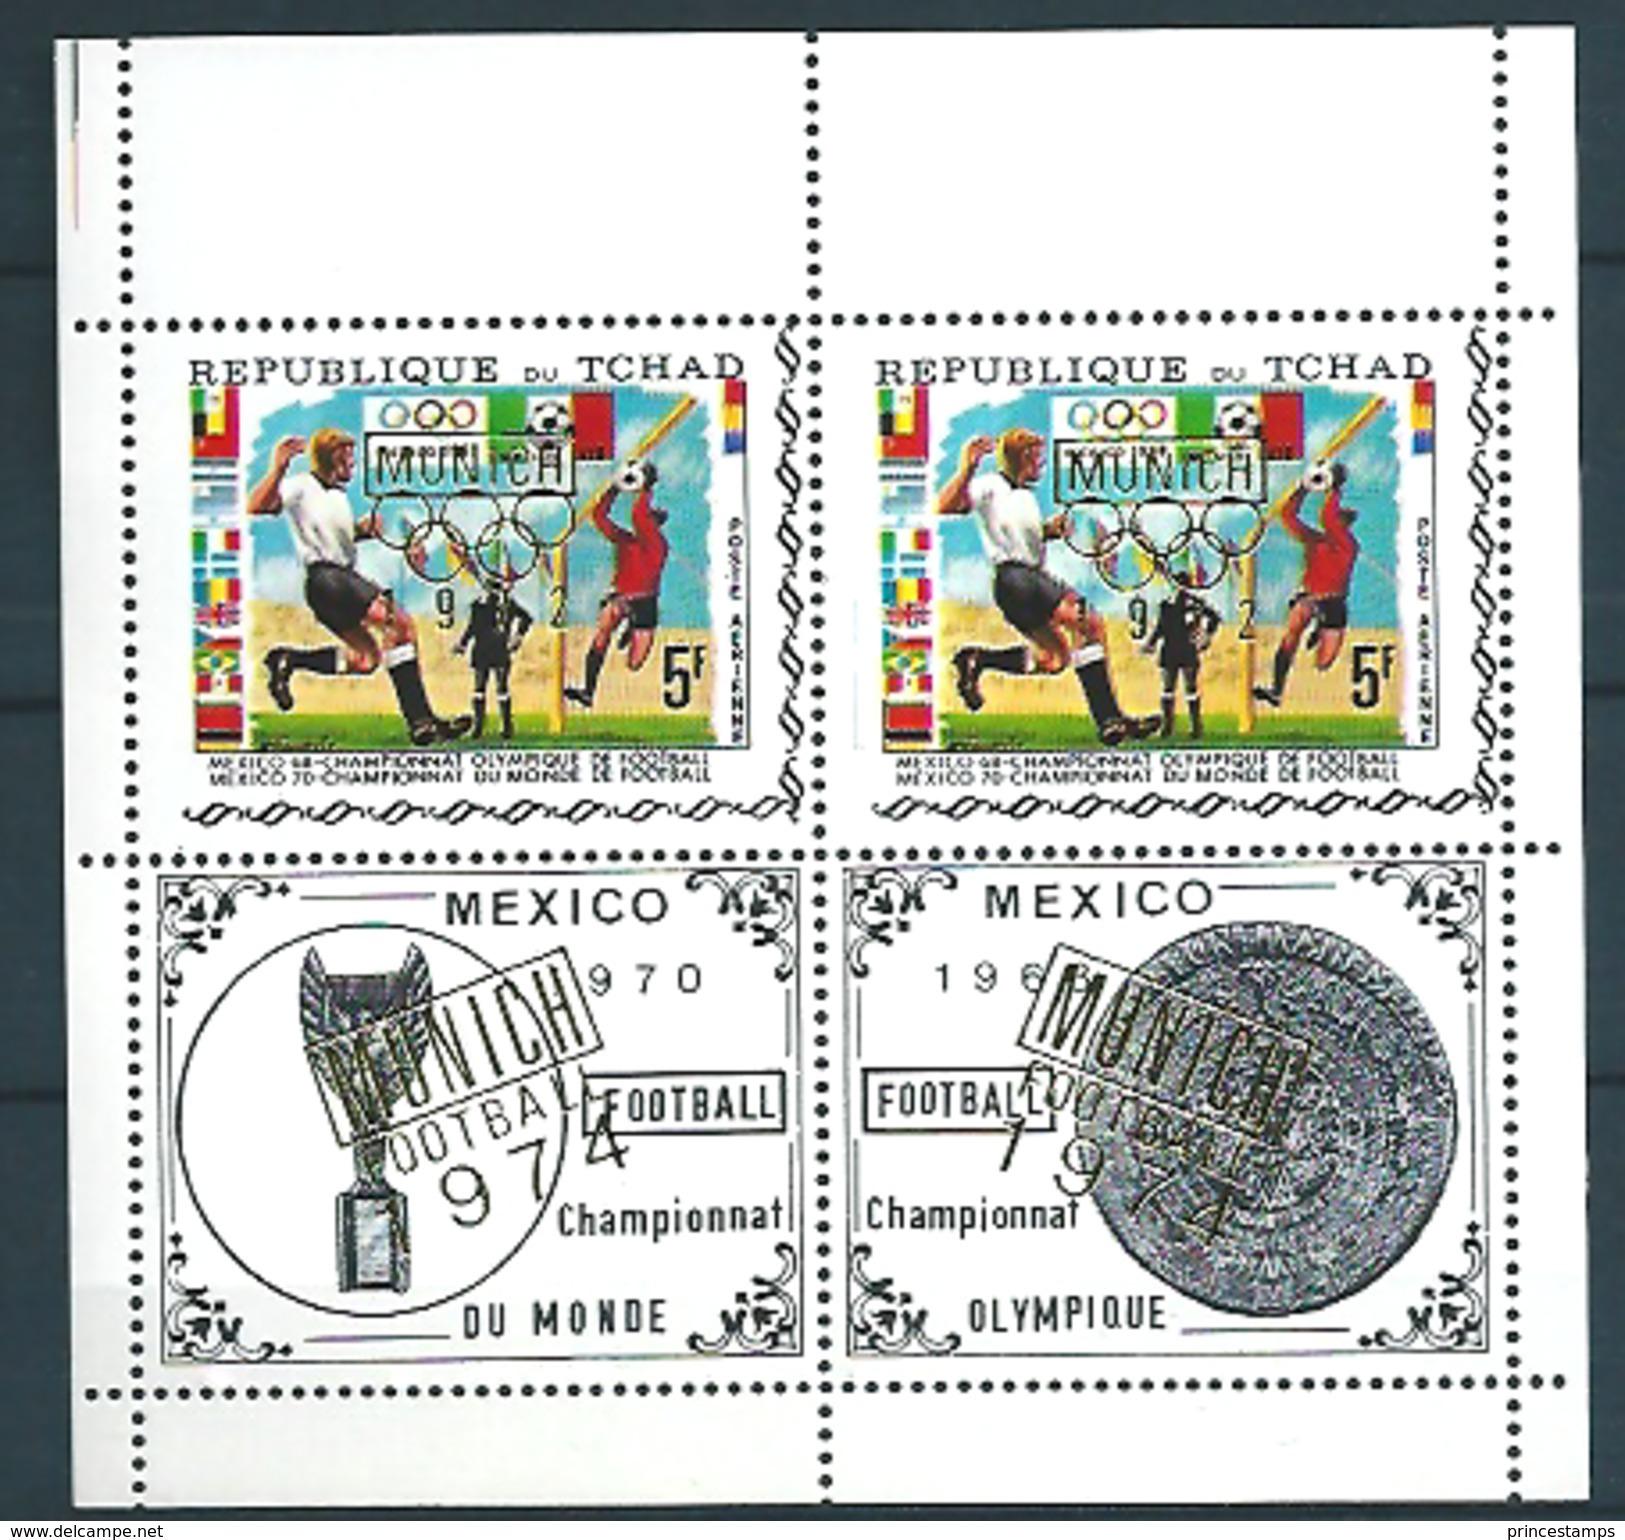 Tchad (1971) Mi. 404 (Pair)  /  Soccer - Calcio - Football - FIFA World Cup Mexico - Olympic Games Munich 1972 - Wereldkampioenschap